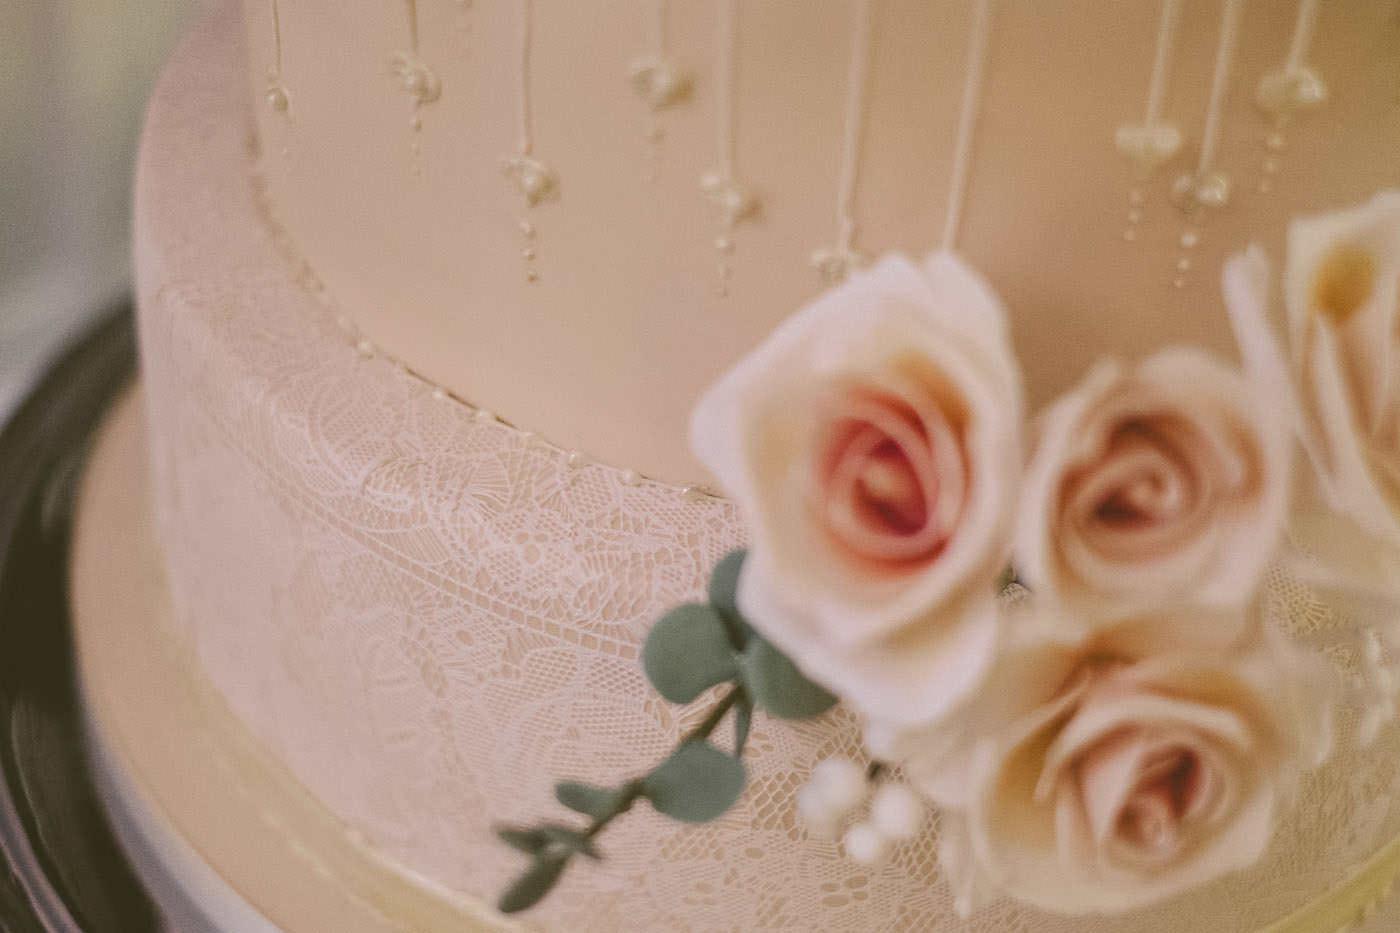 edmundjasveen burford bridge hotel wedding photographer 0097